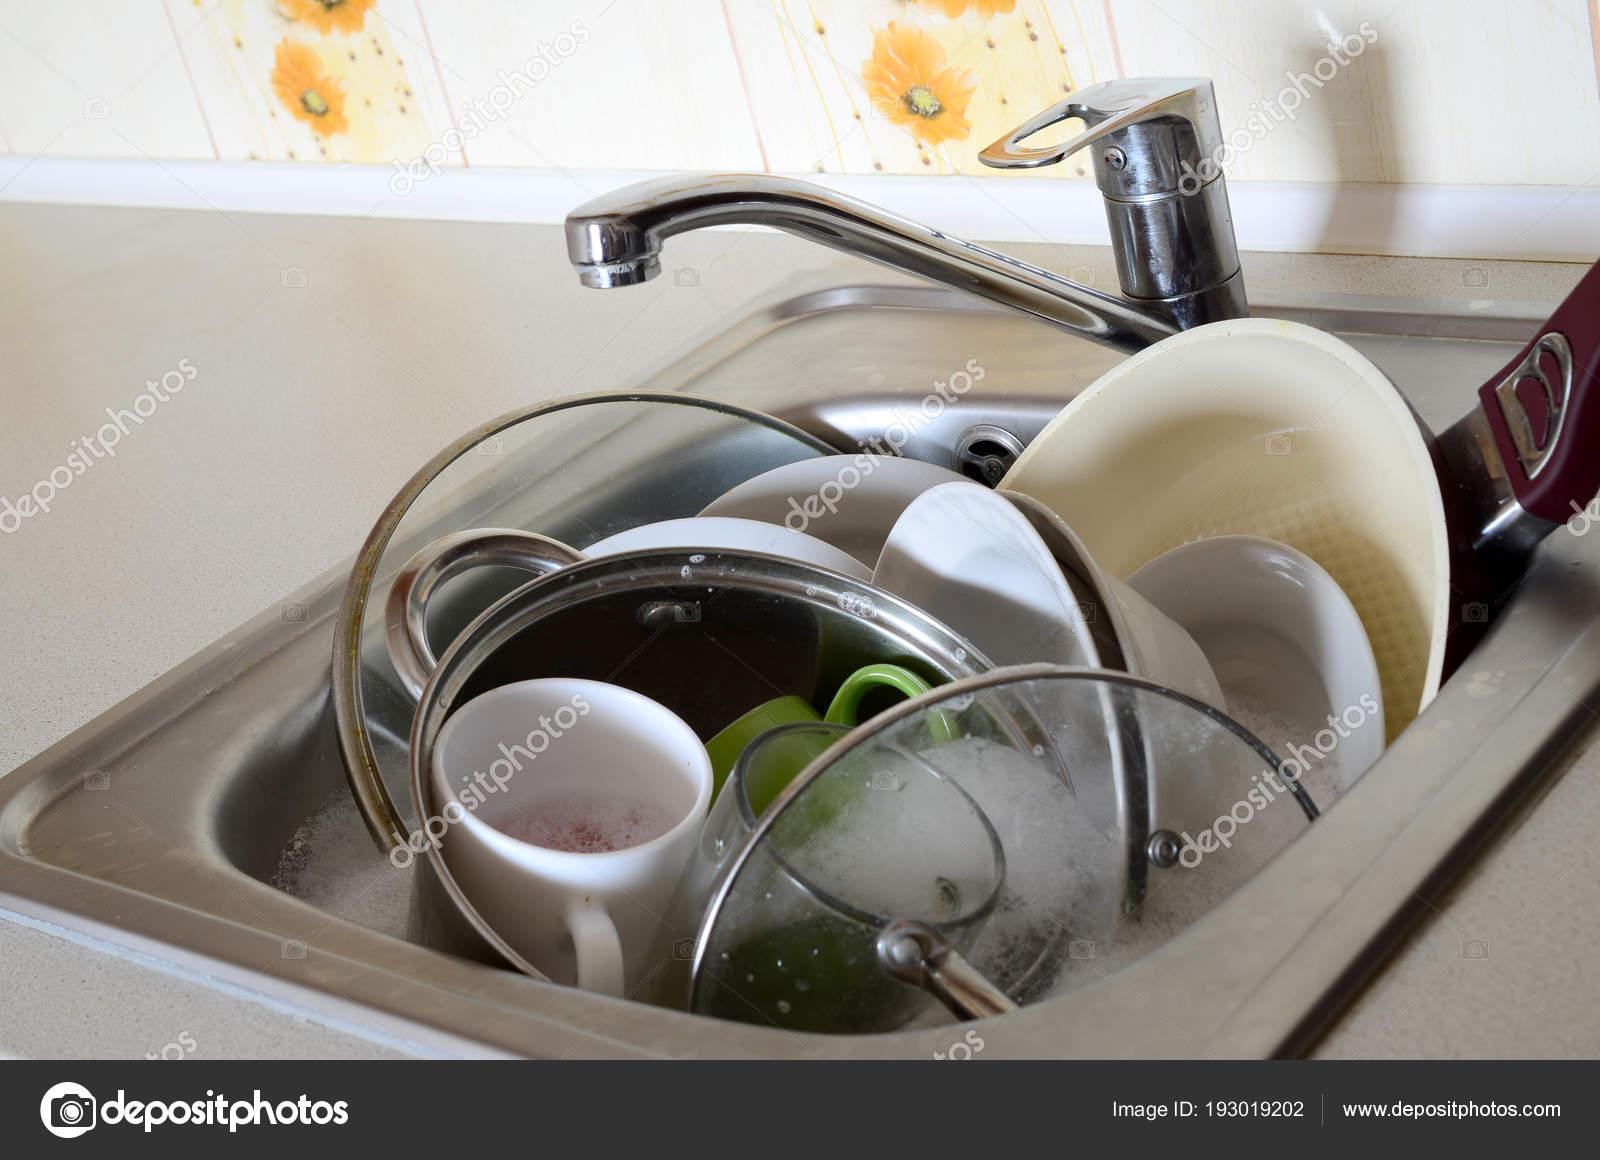 Dirty Dishes Unwashed Kitchen Appliances Filled Kitchen Sink ...